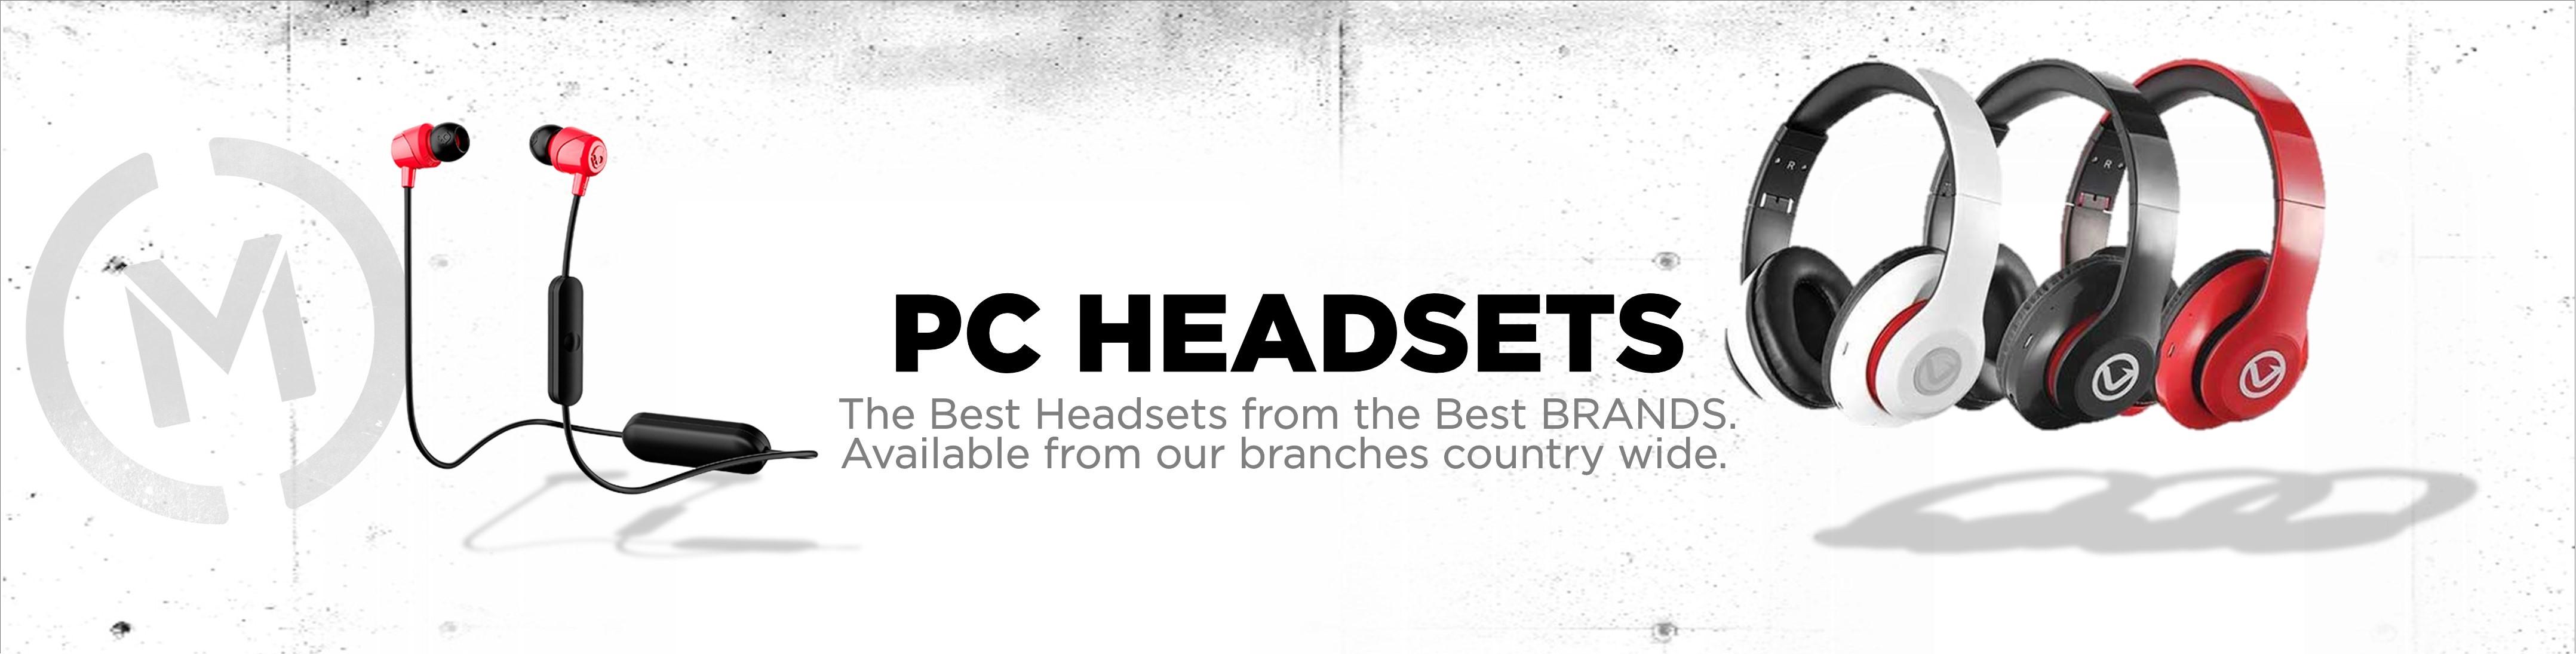 Matrix PC Headsets Banner